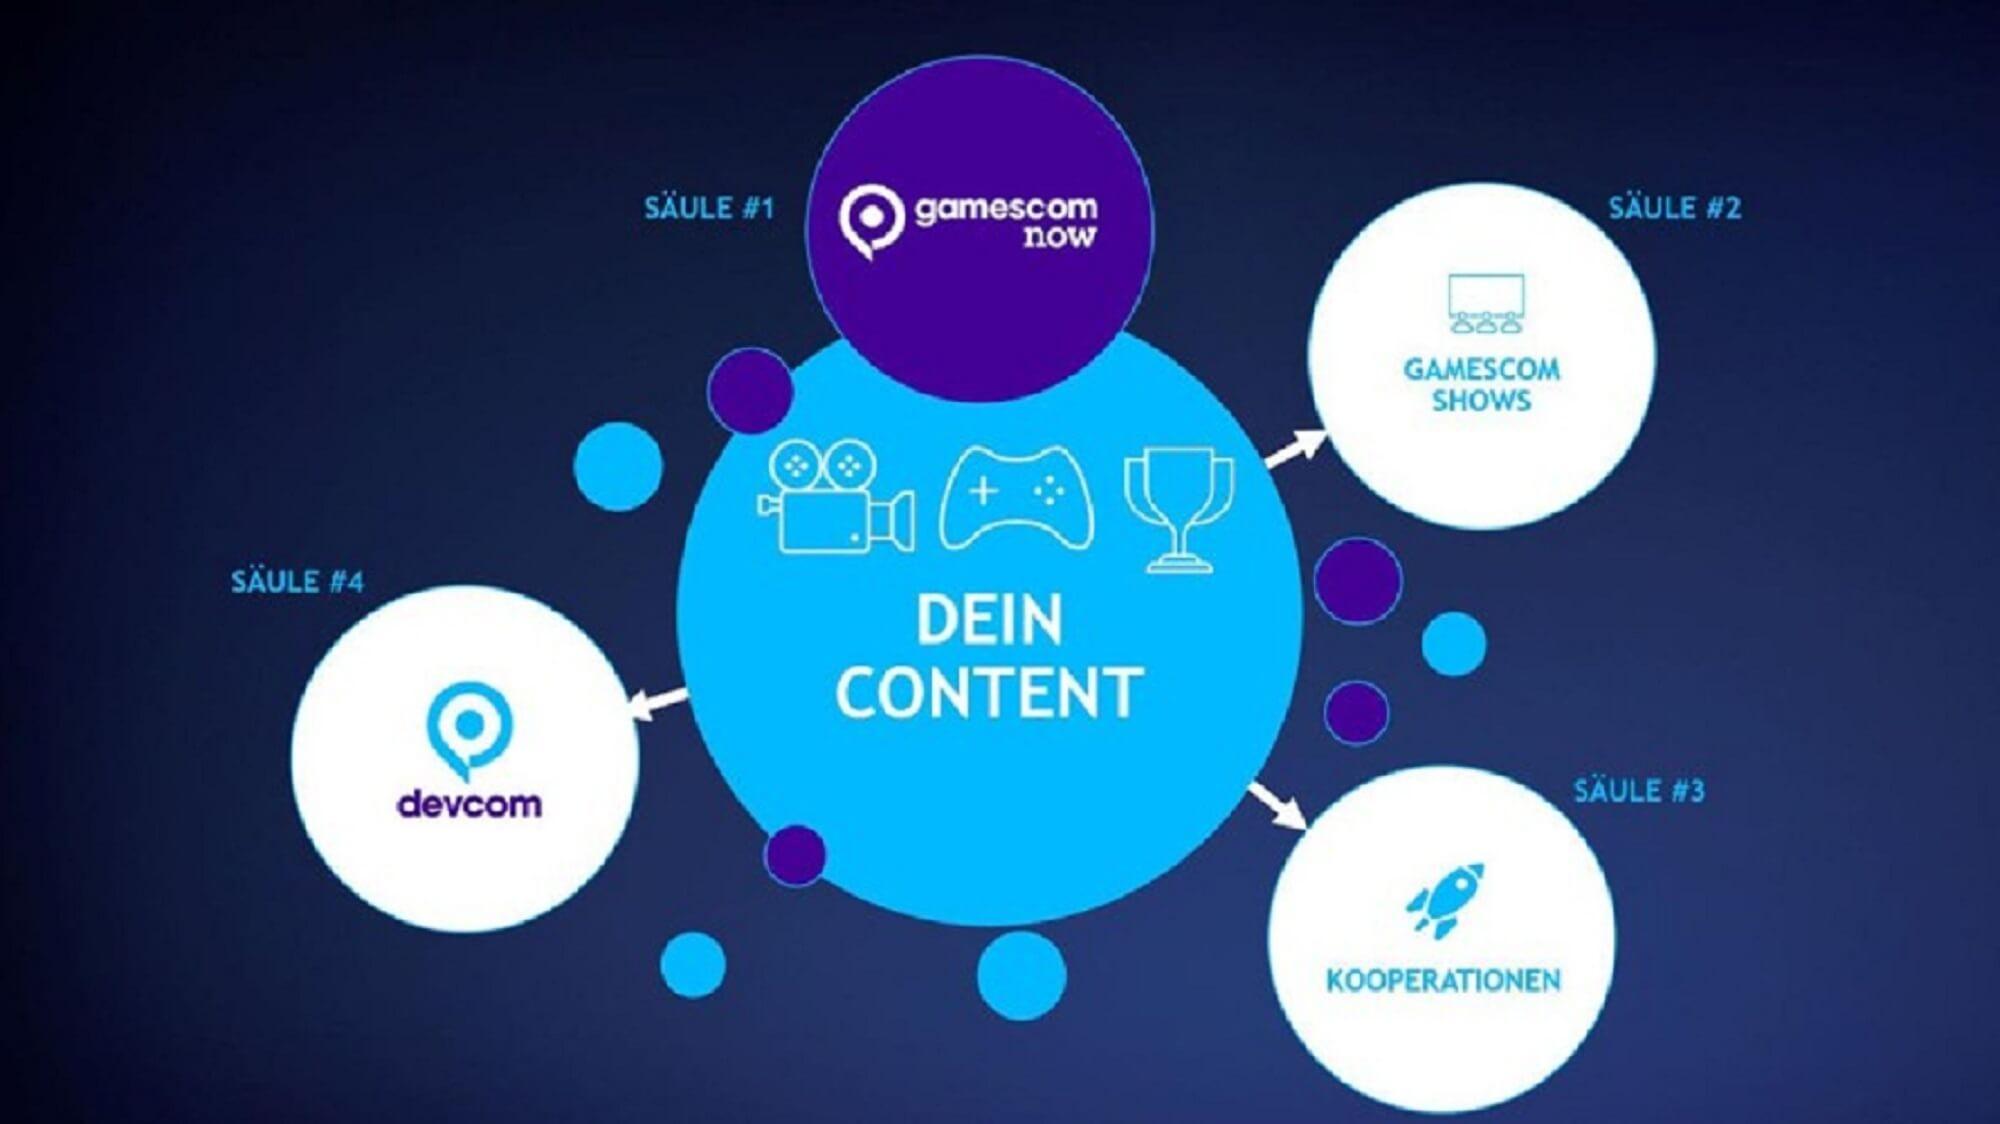 Contenthub der Gamescom verschiedene Programmpunkte